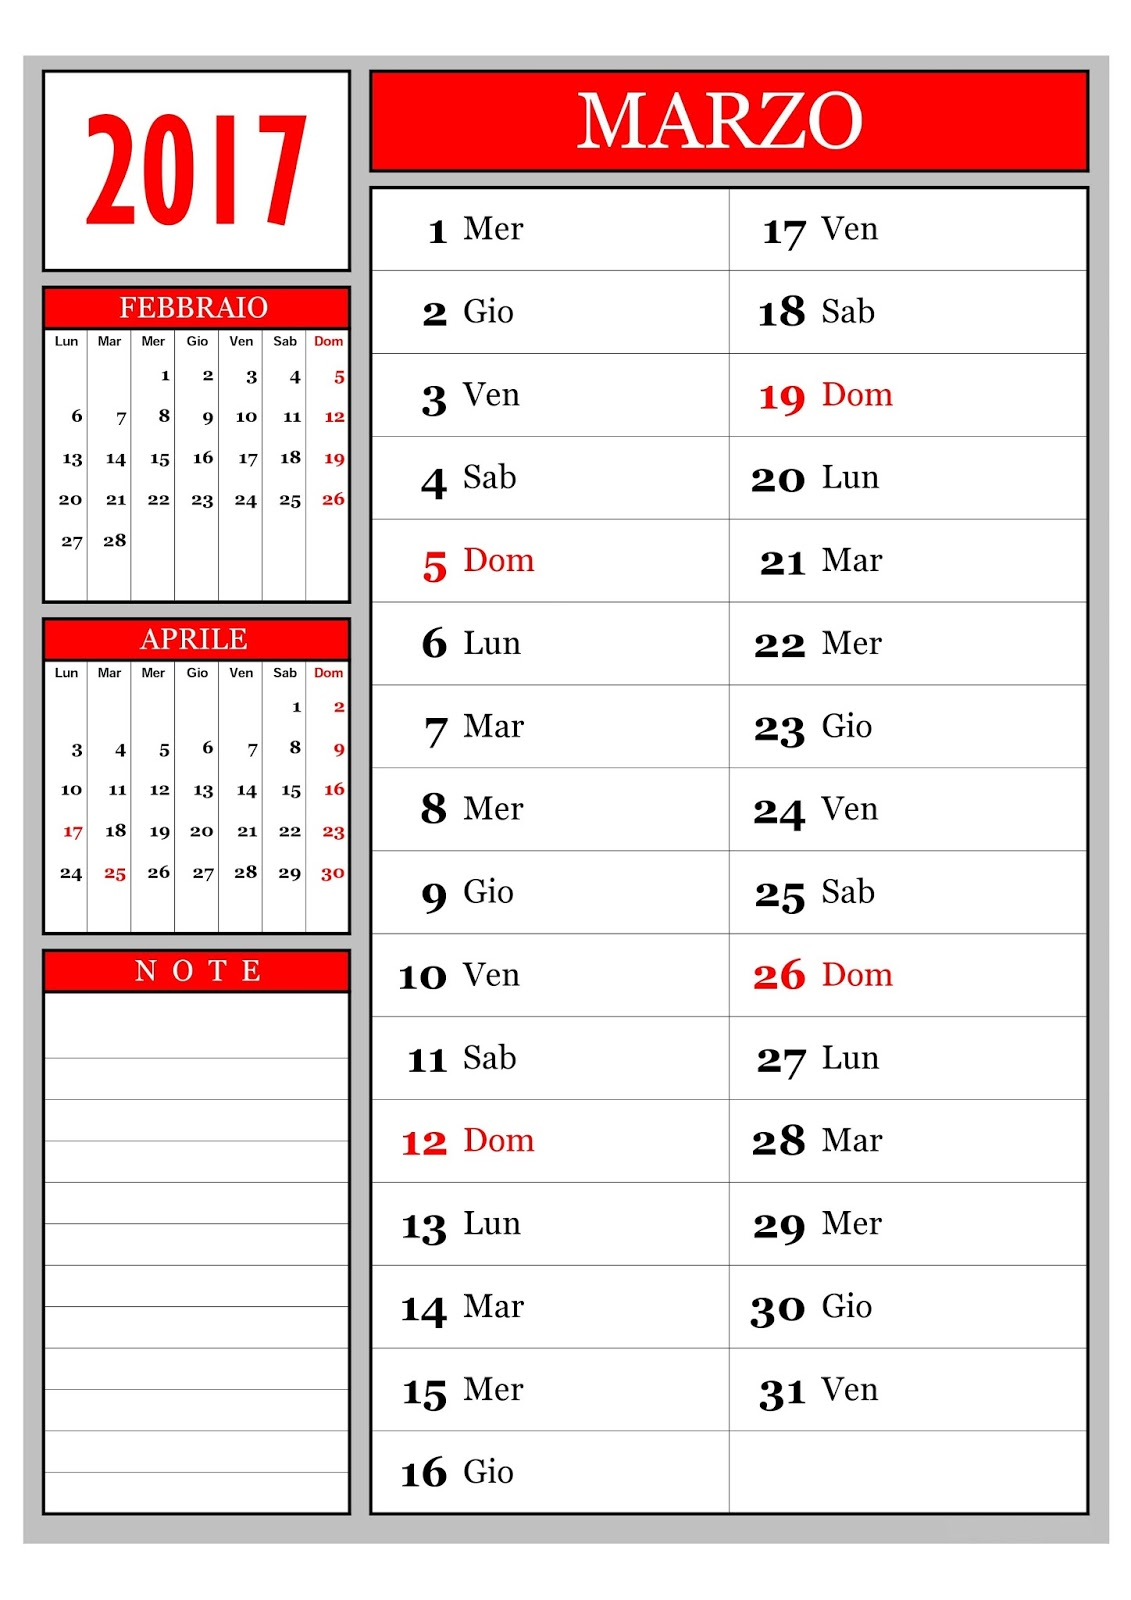 Marzo Calendario.Calendario Calendario Mensile Marzo 2017